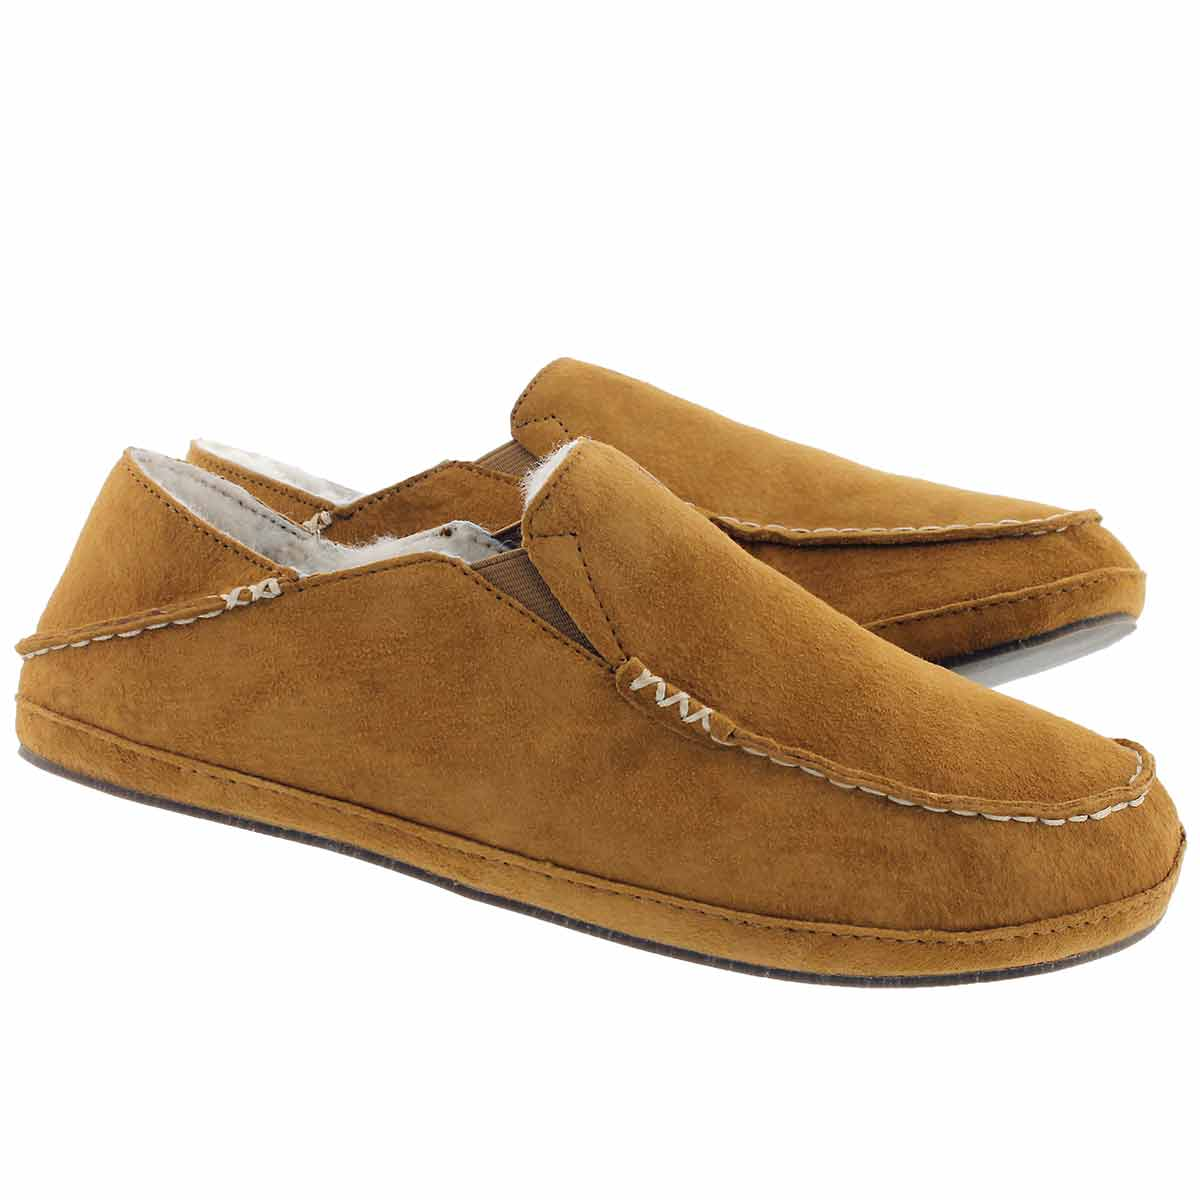 Mns Moloa tobacco drop in heel slipper